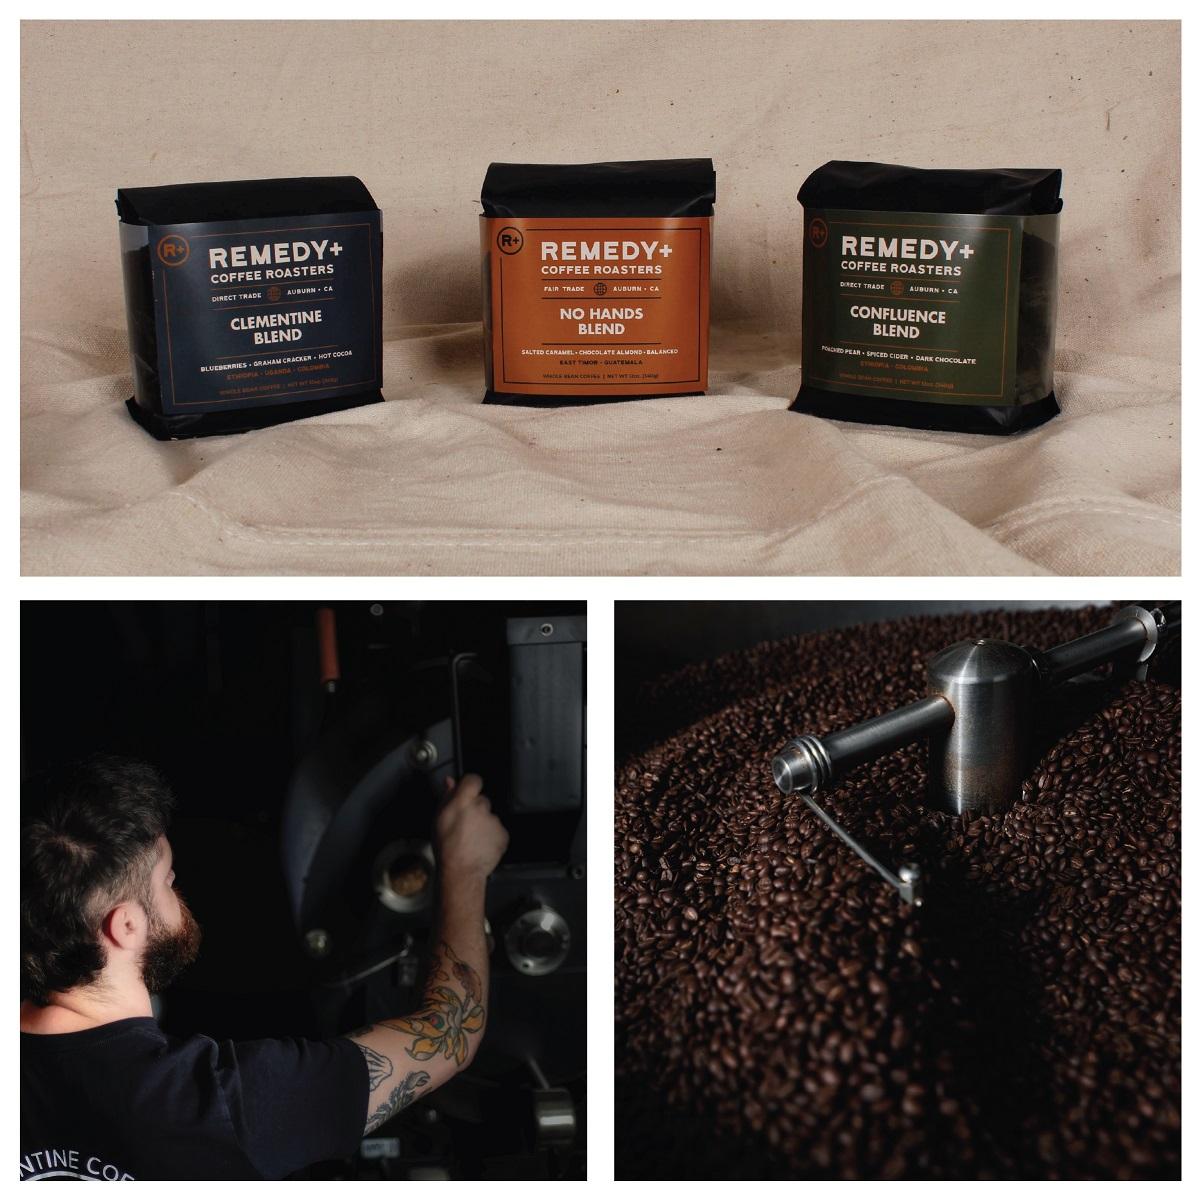 Remedy Supply Co.